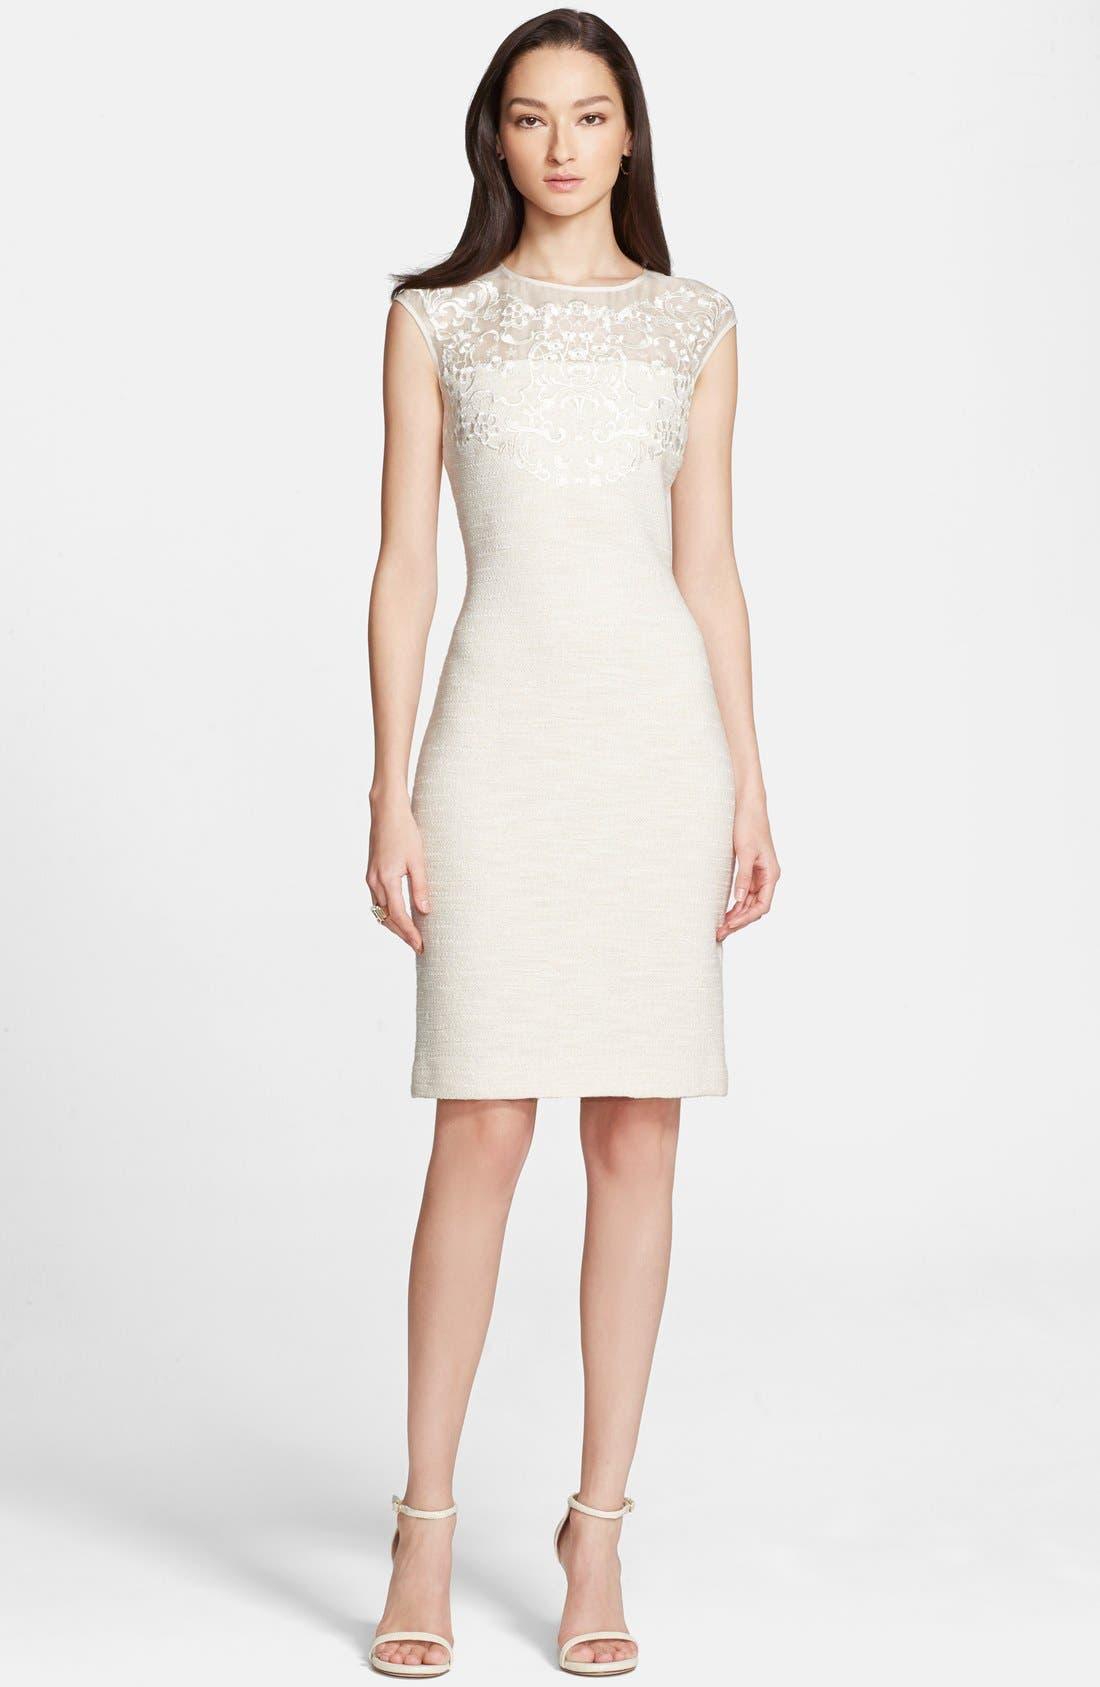 Main Image - St. John Collection Sparkle Shantung Knit Dress